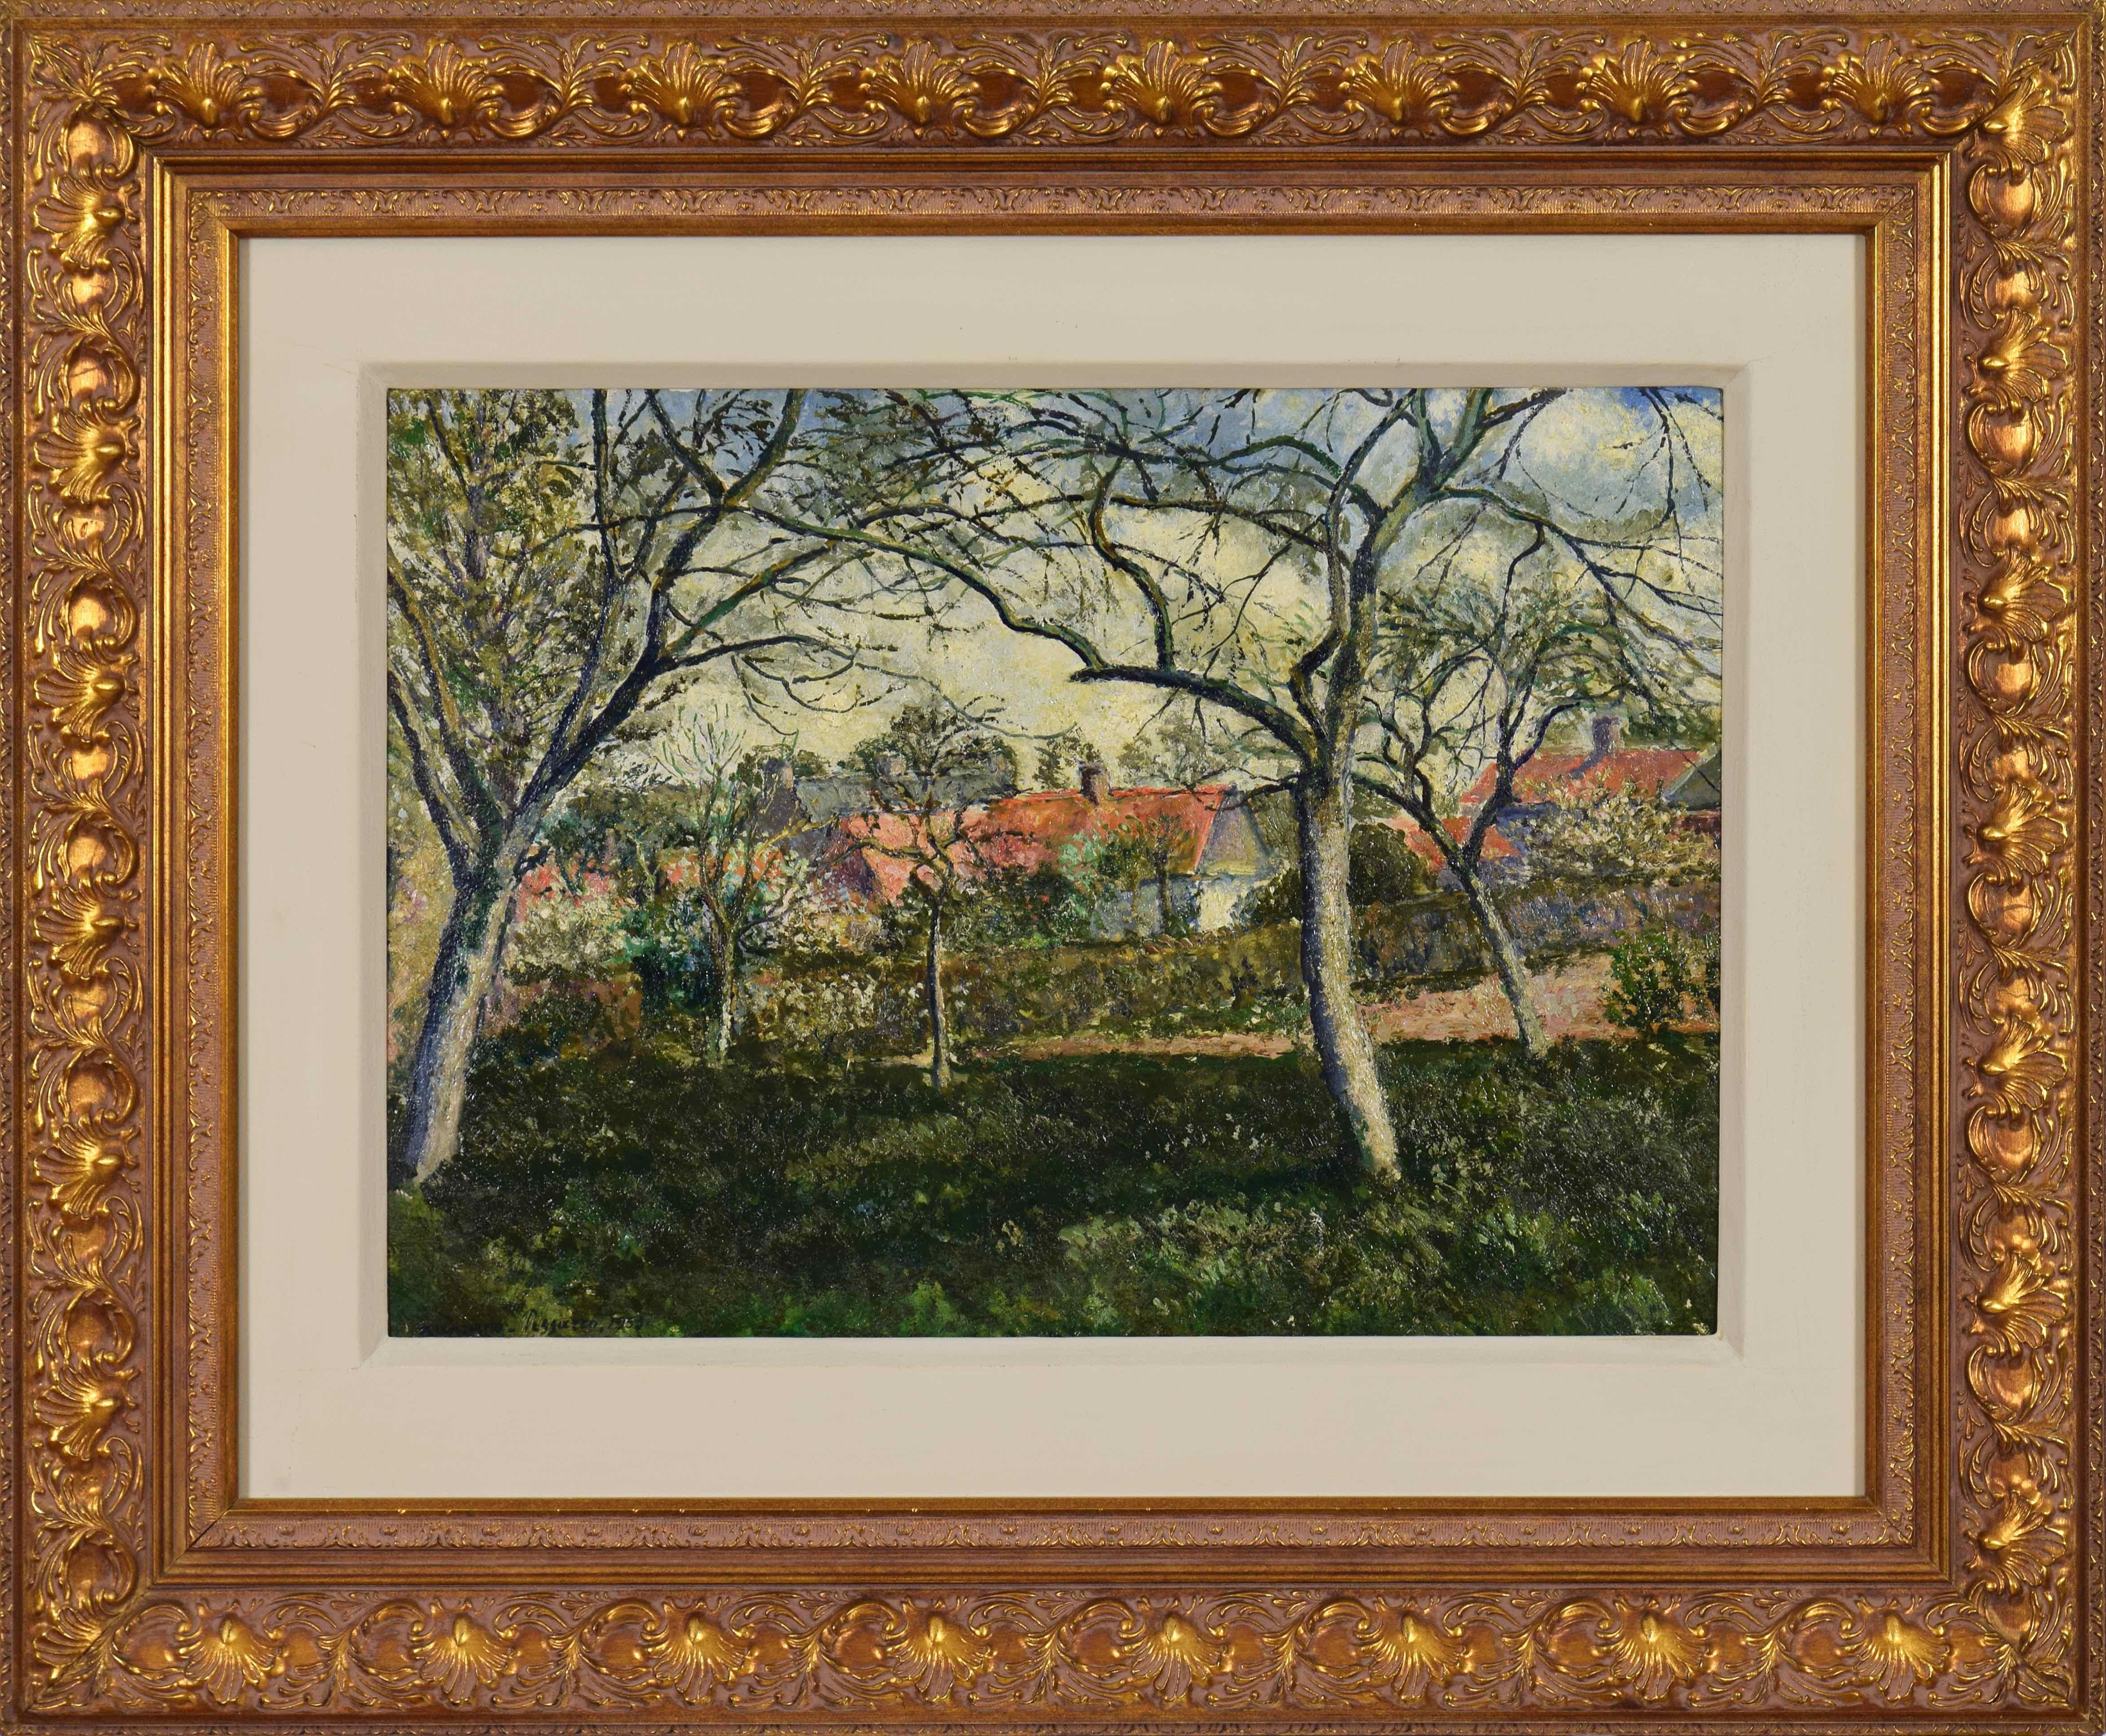 Landscape painting by Georges Manzana Pissarro titled Toits Rouges à Menton